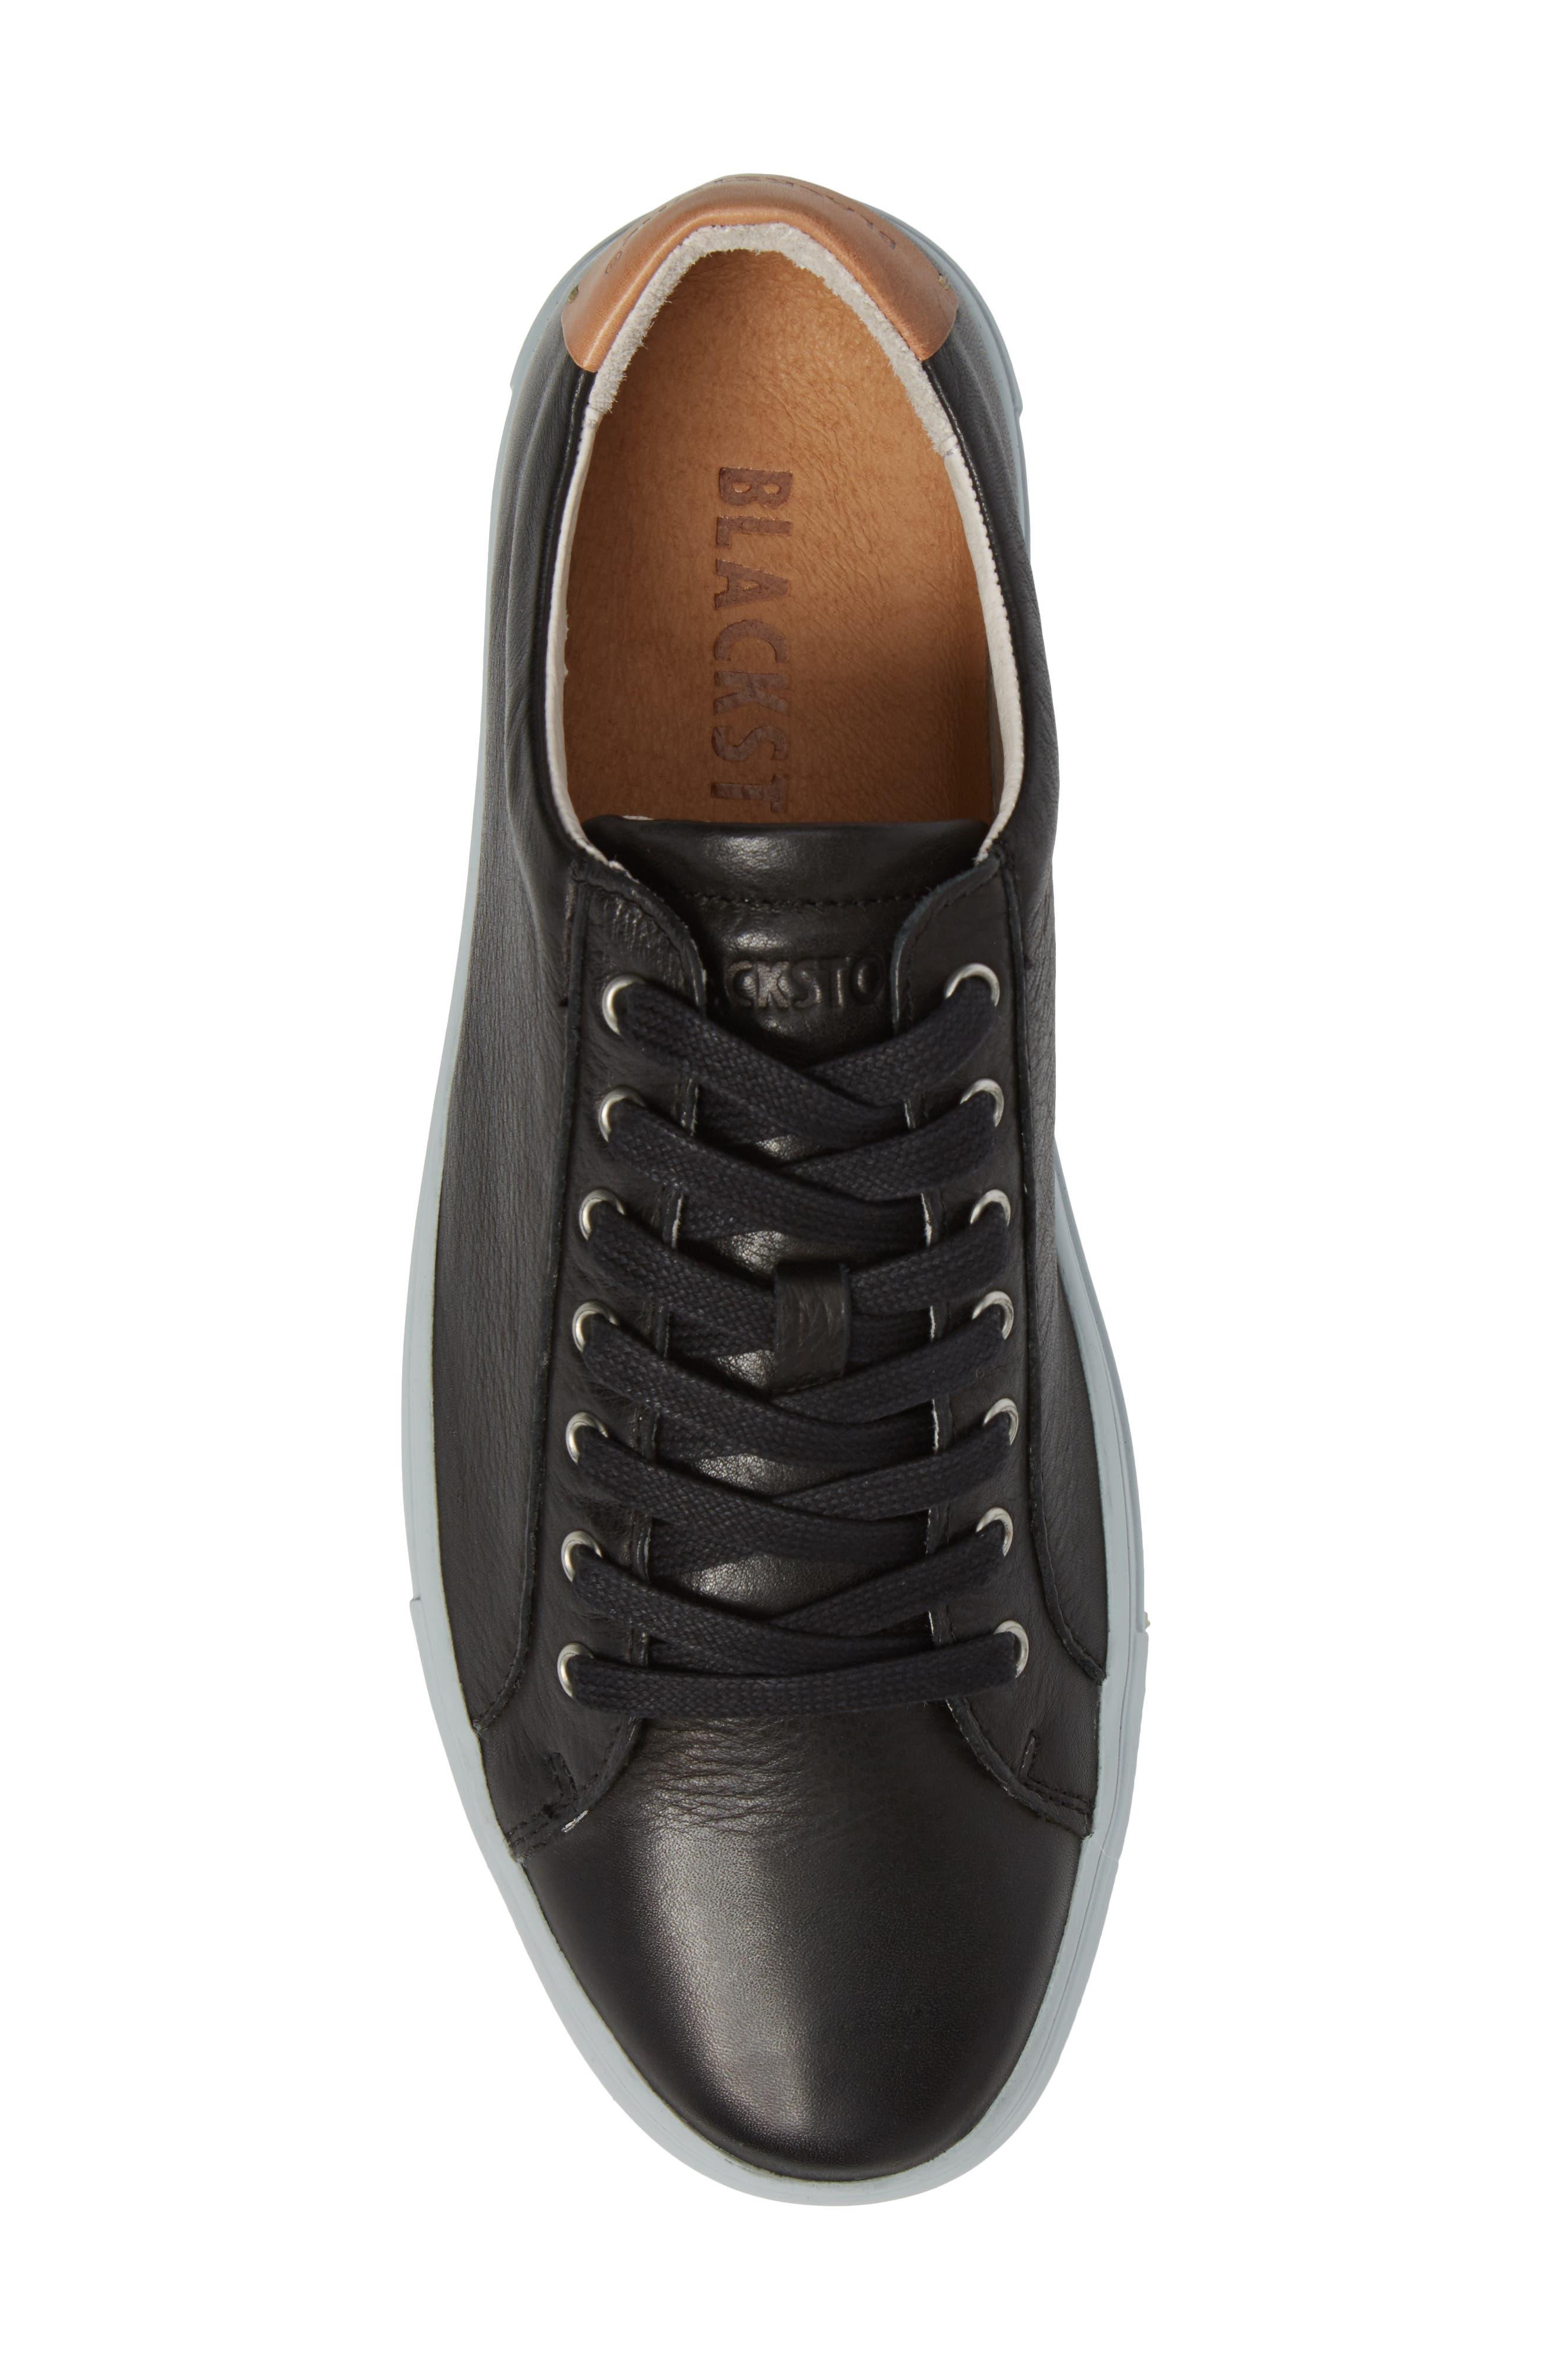 NM01 7 Eyelet Sneaker,                             Alternate thumbnail 5, color,                             BLACK LEATHER